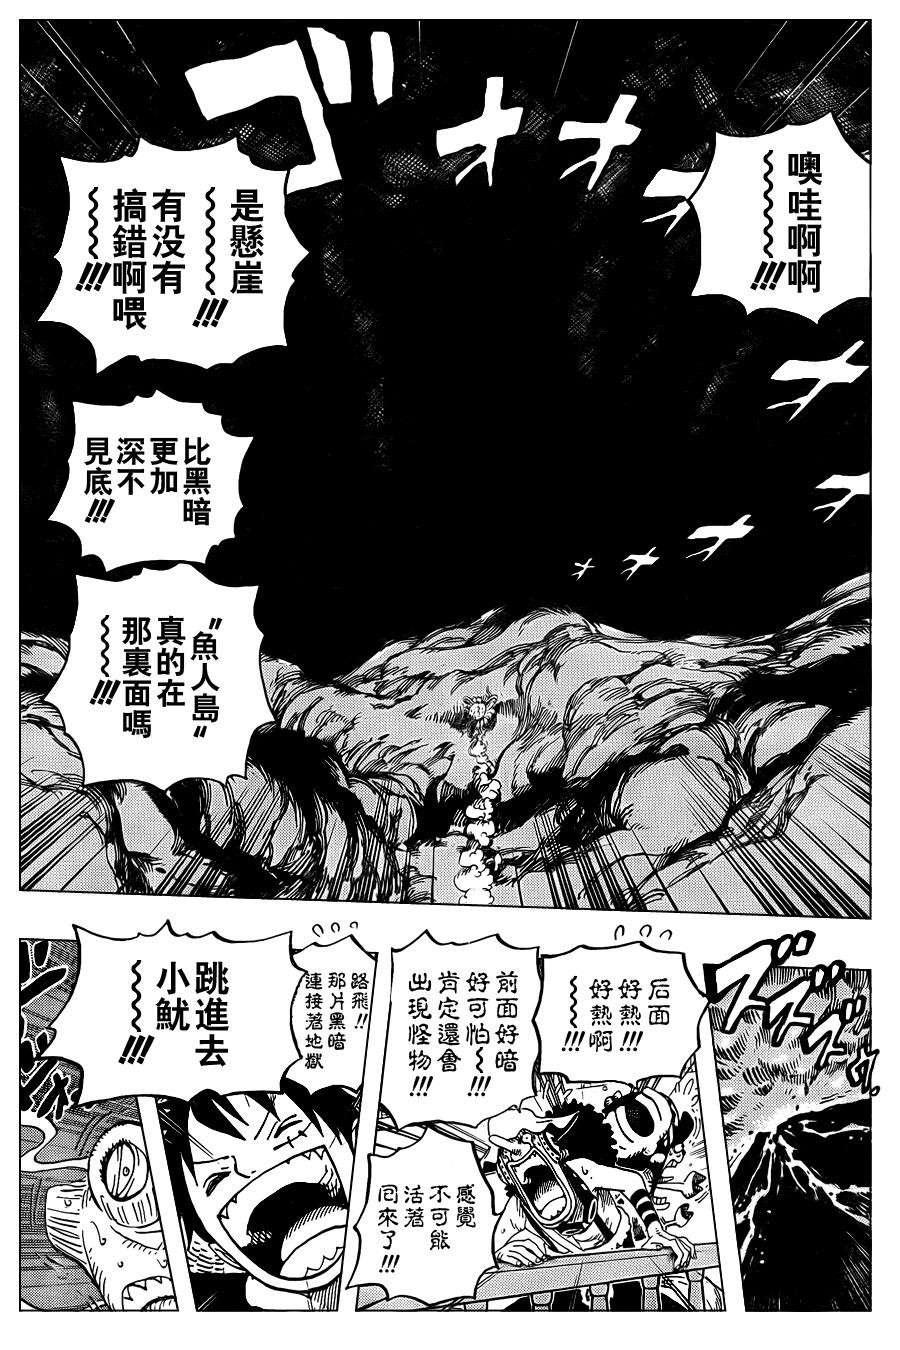 One Piece Manga 607 Spoiler Pics 0612